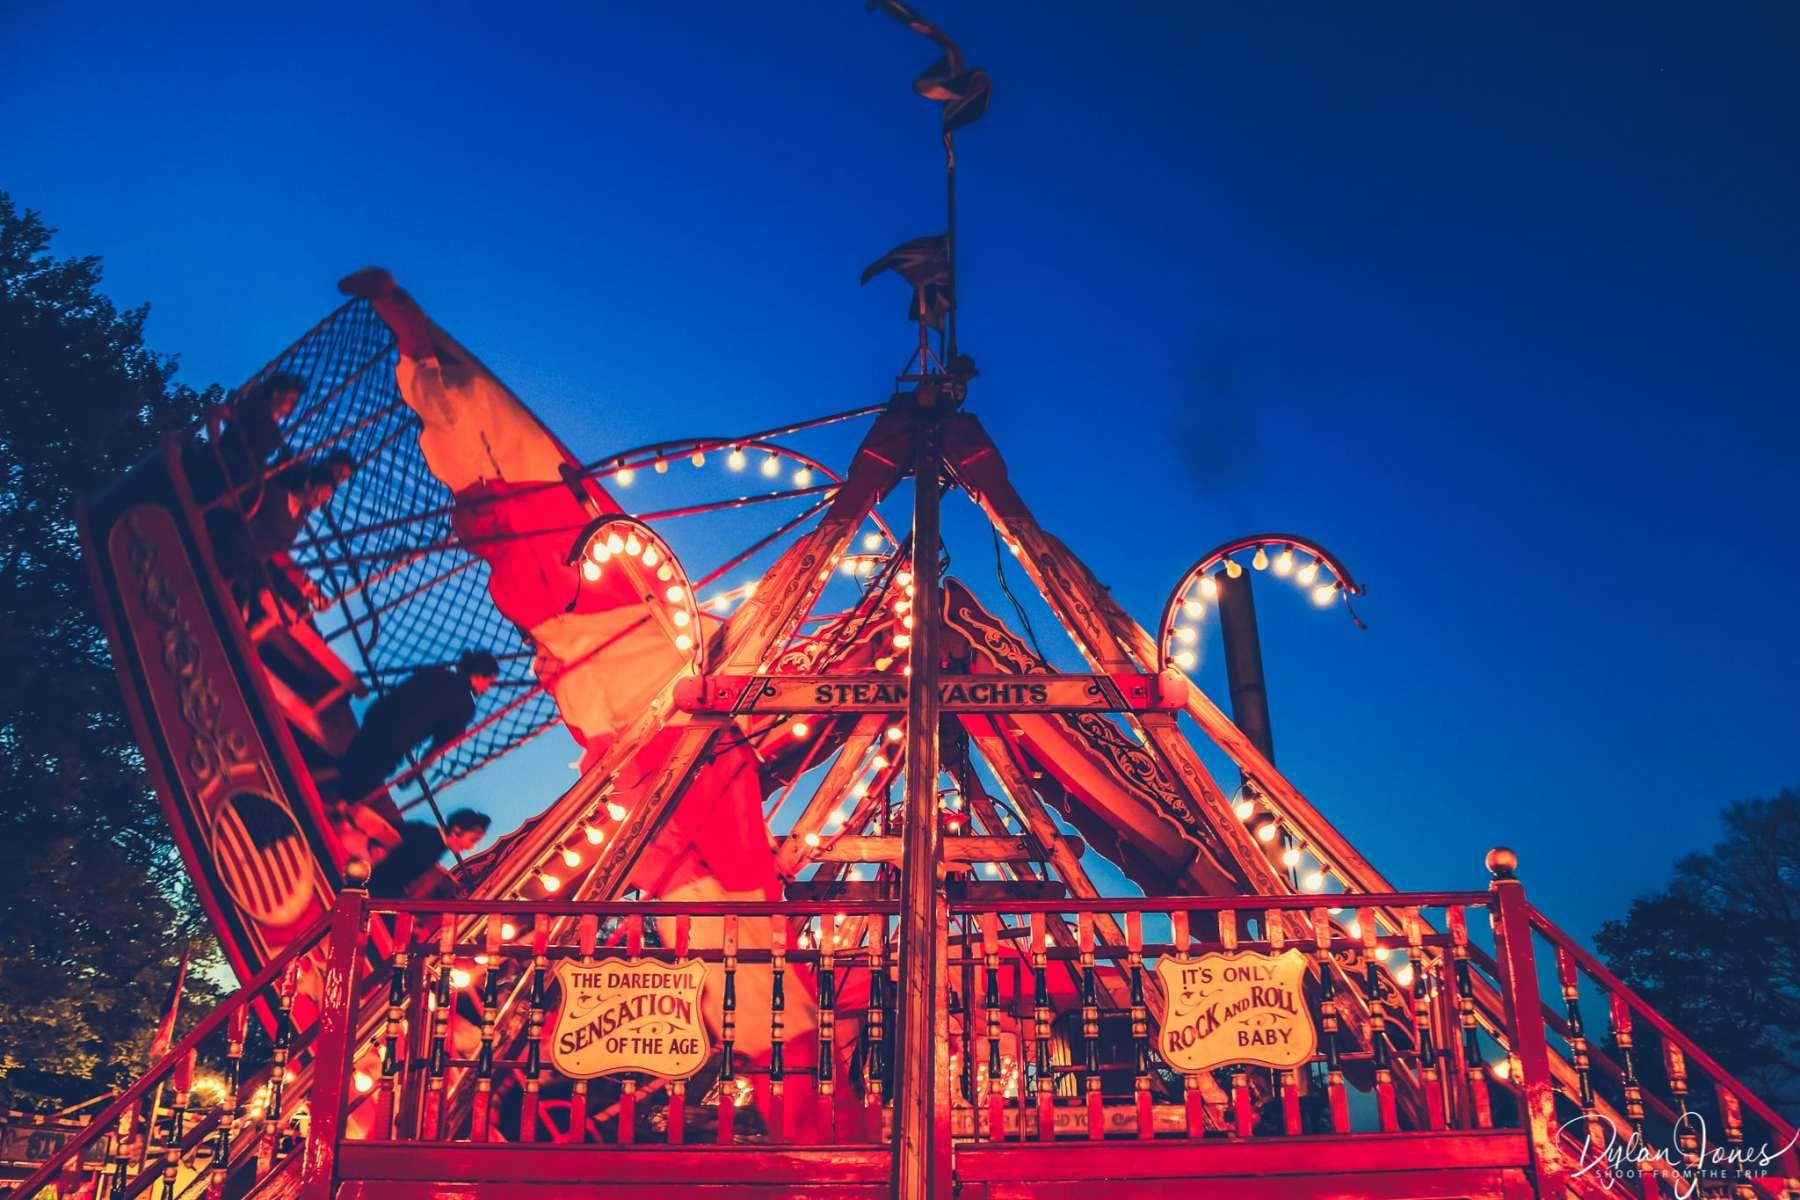 Ad A Vintage Fairground Experience At Carters Steam Fair Shoot